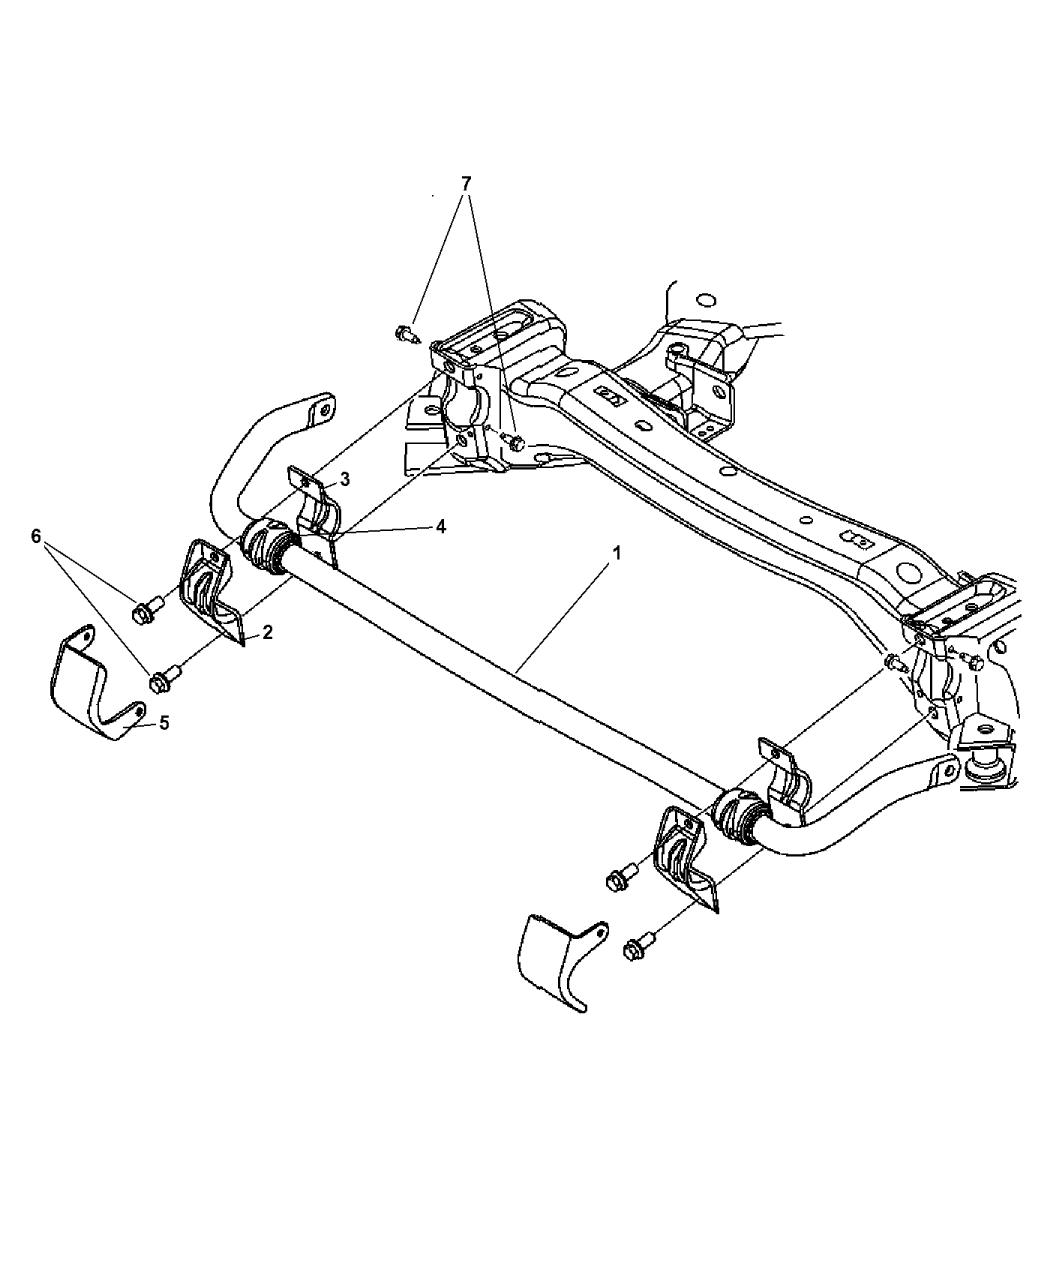 2007 Dodge Charger Front Stabilizer Bar - Mopar Parts Giant